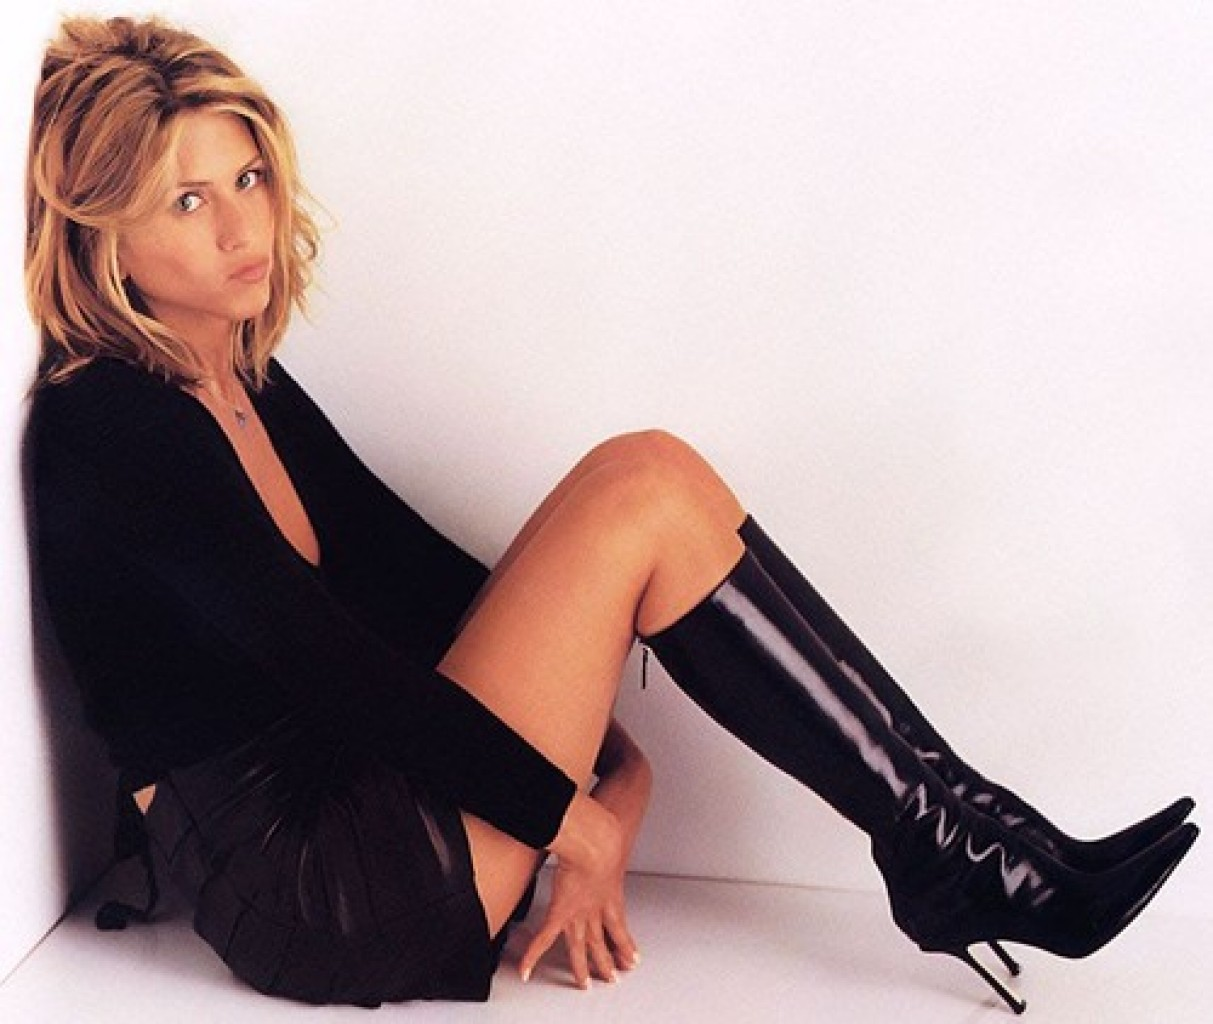 Boot Nation Celebrity Boot Month Blonds Jennifer Aniston